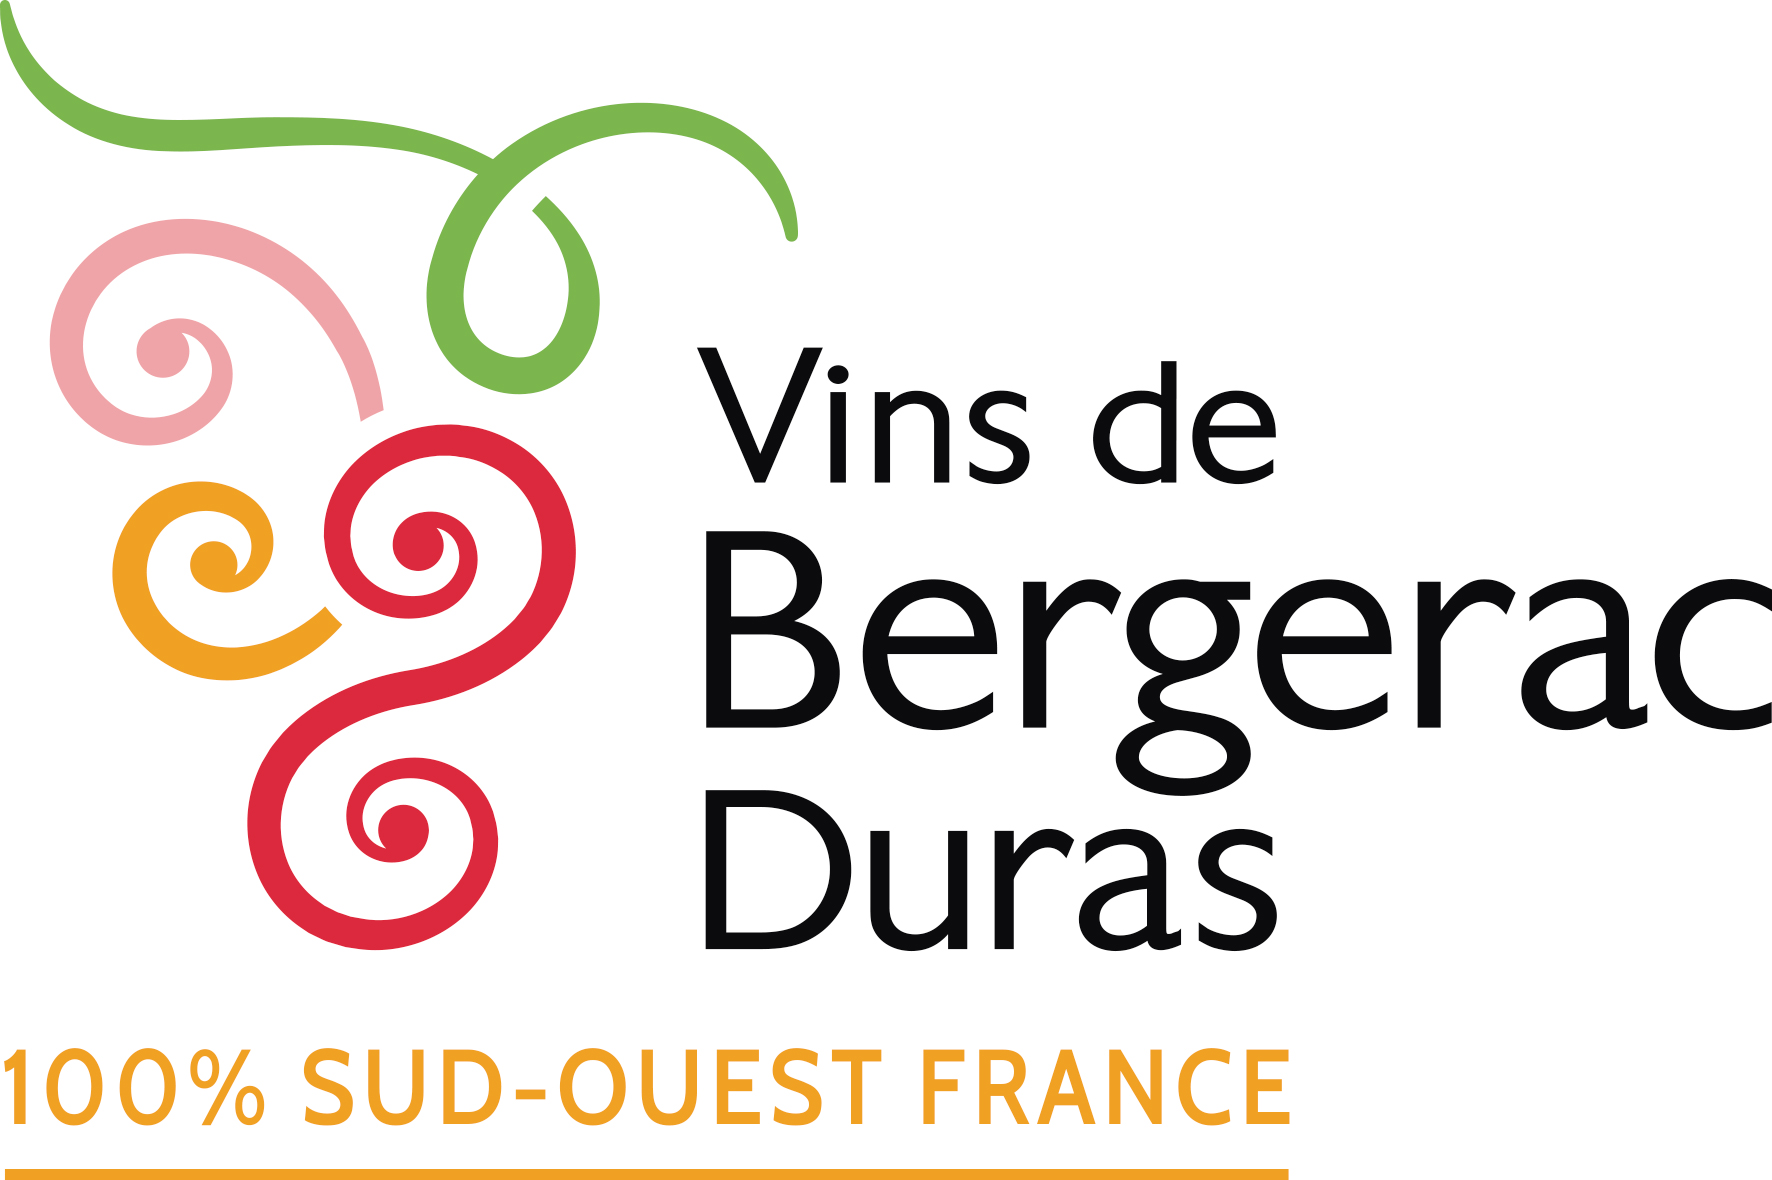 Les Vins de Bergerac et Durac